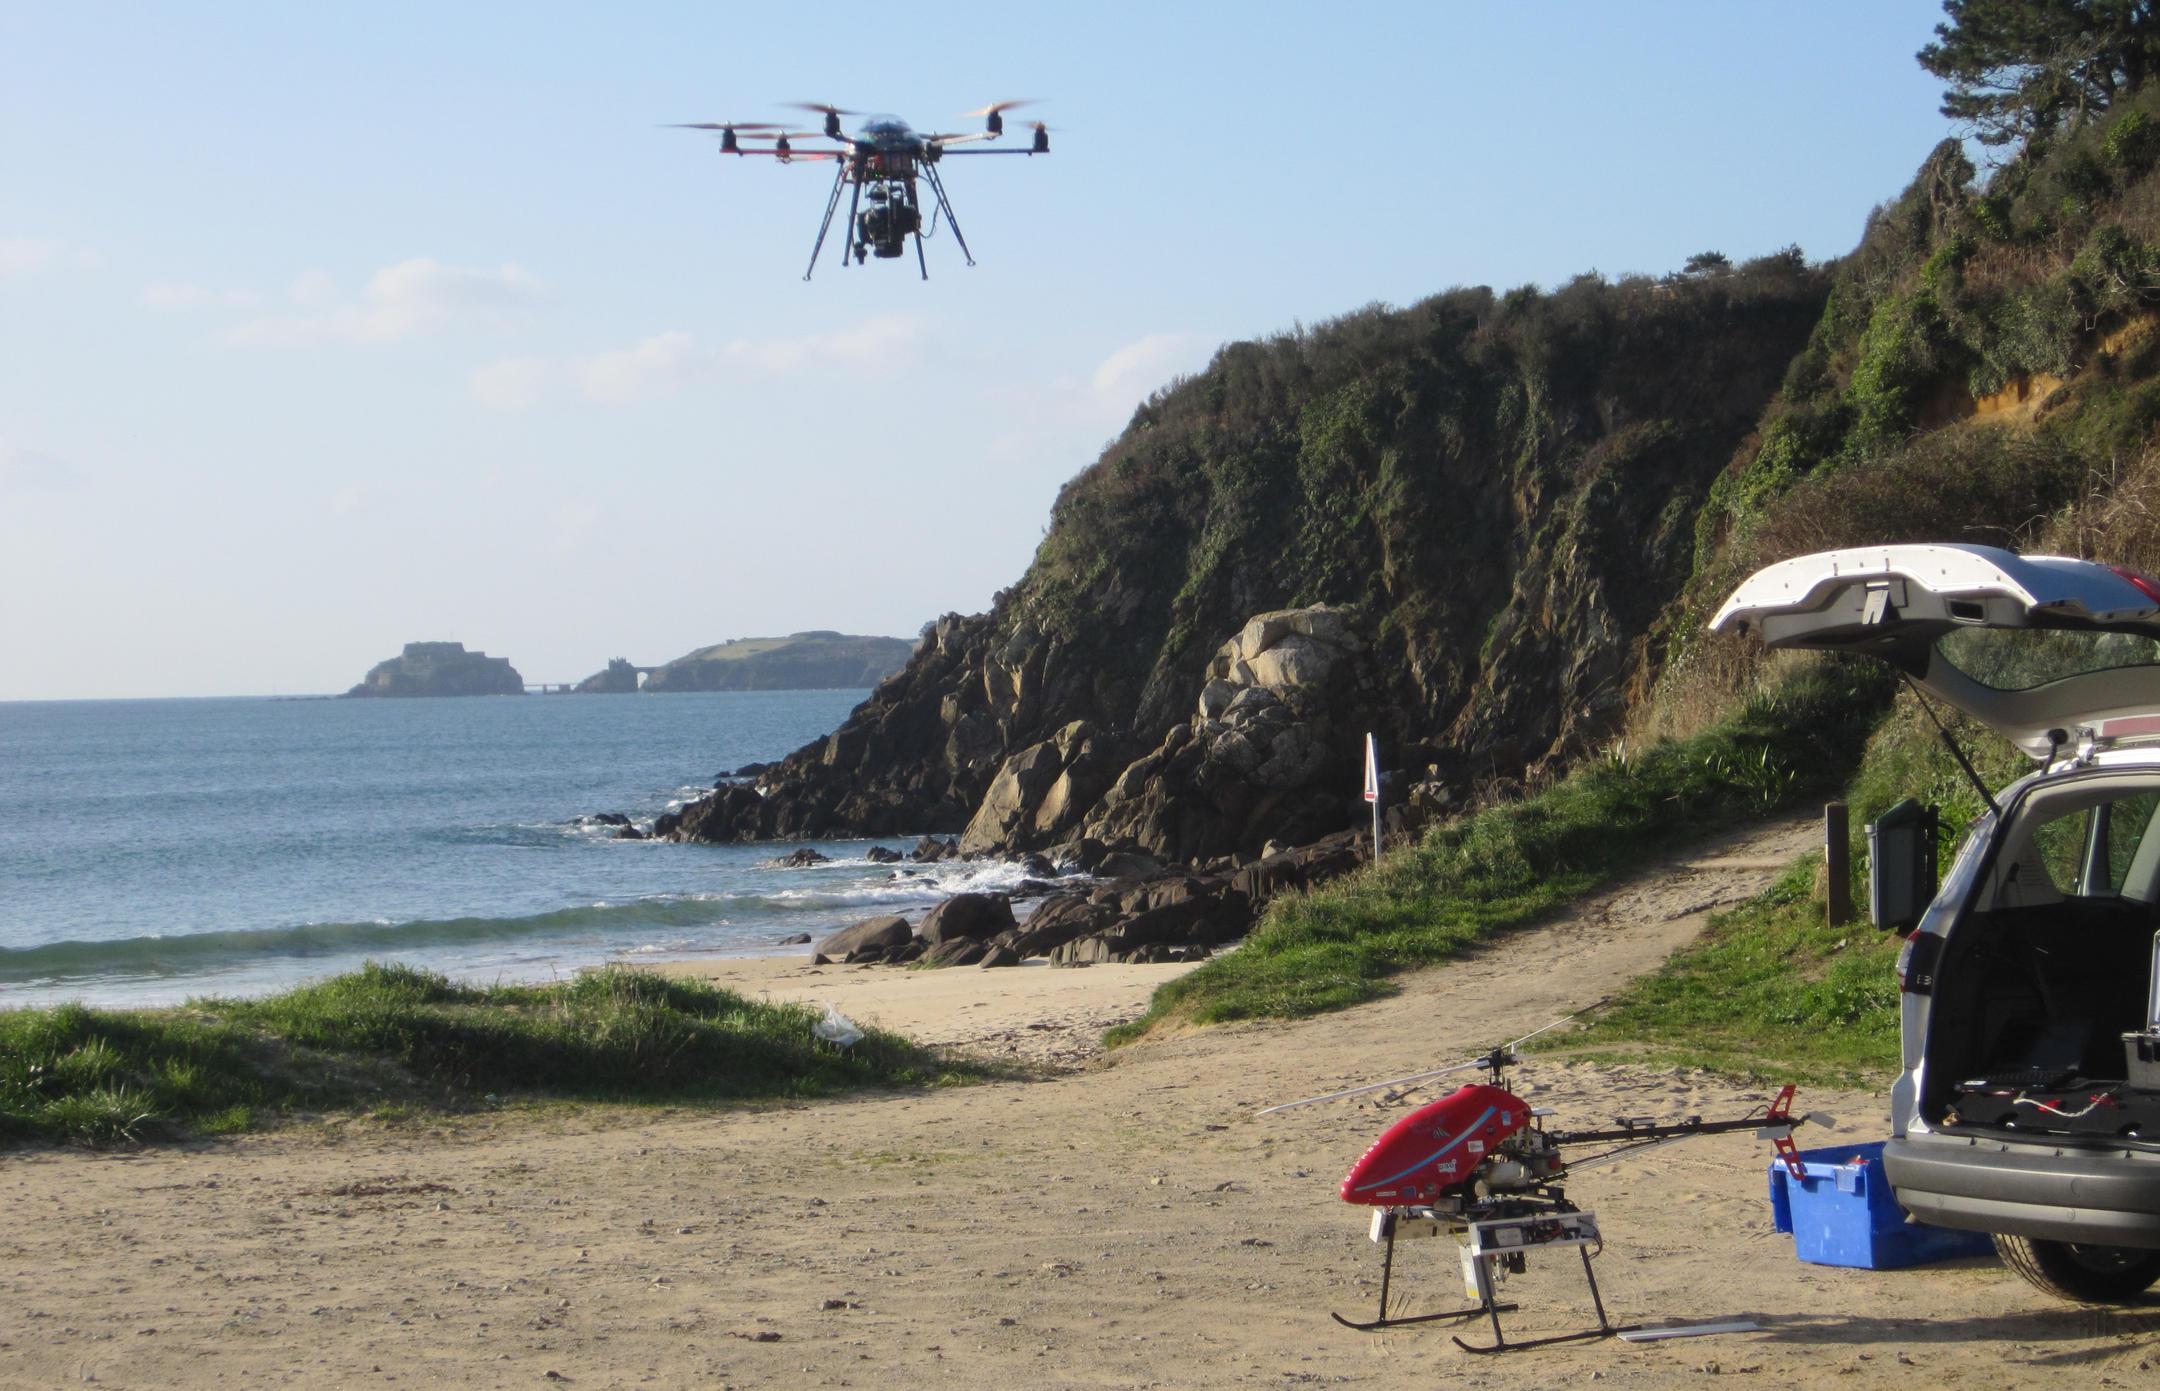 Acheter dronex pro avis hôpital dron